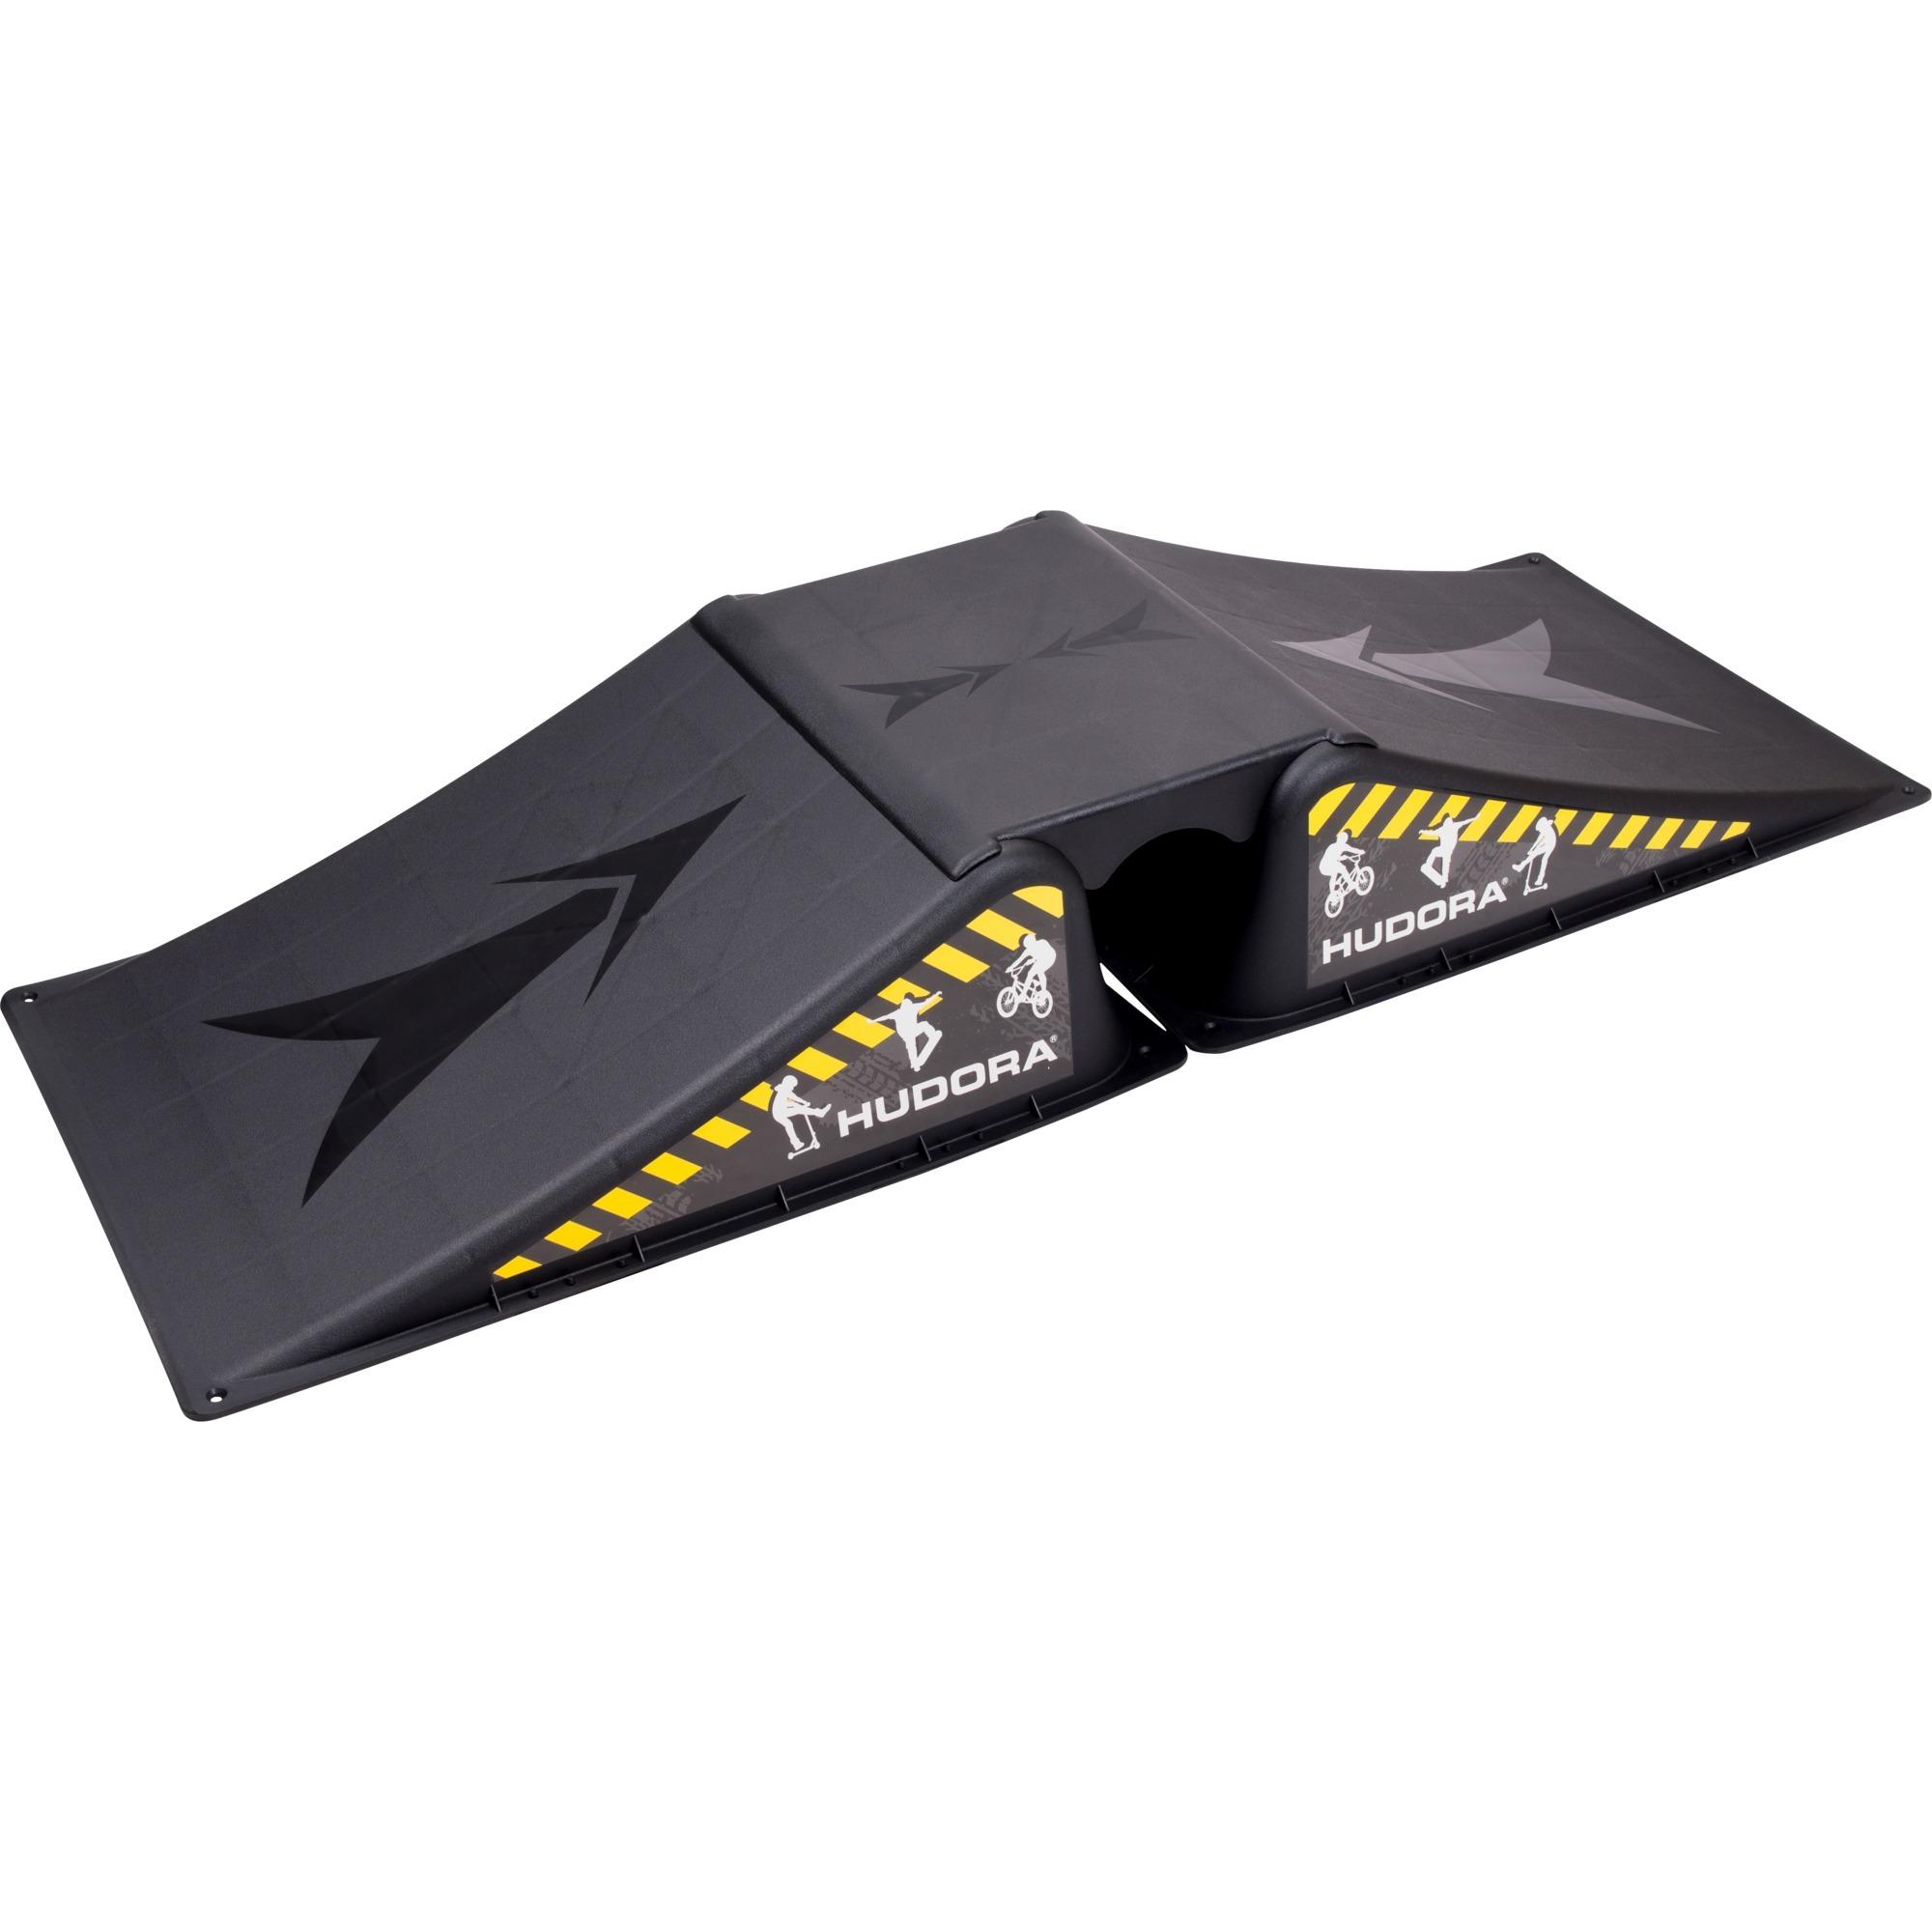 11116 rampa de monopatín 2 pieza(s) Negro